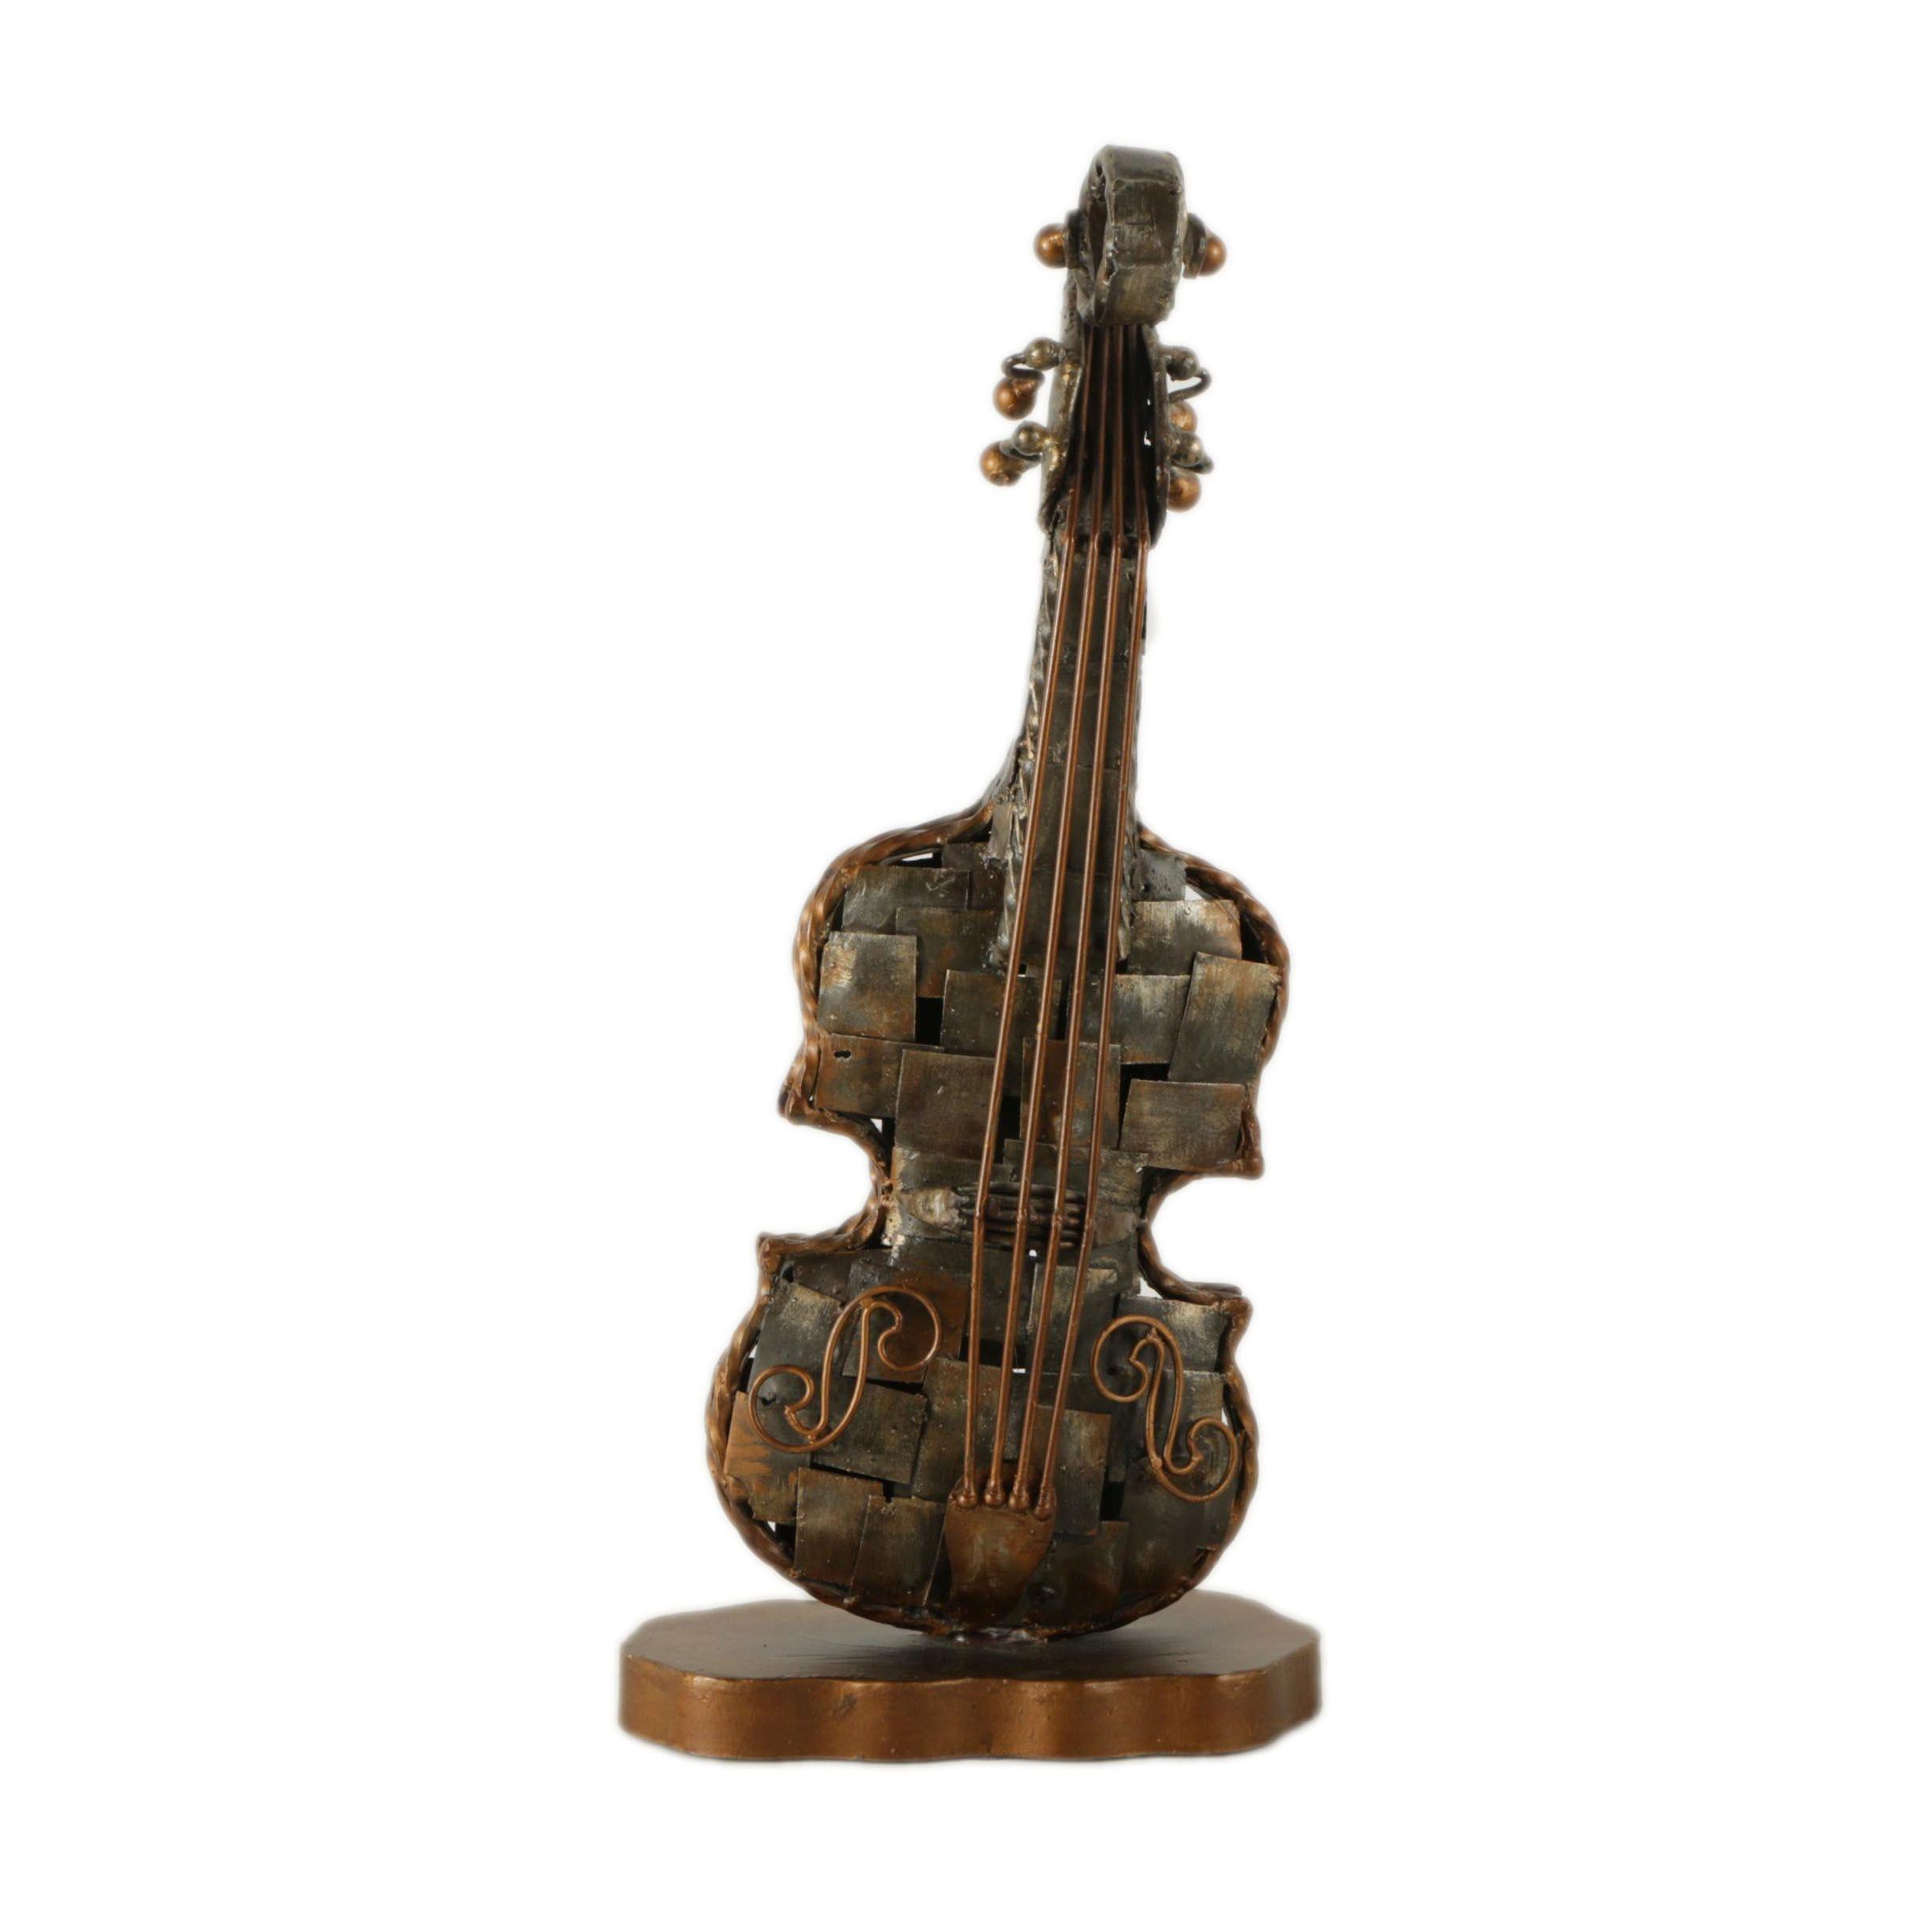 Artmax Painted Iron Alloy Sculpture of Violin